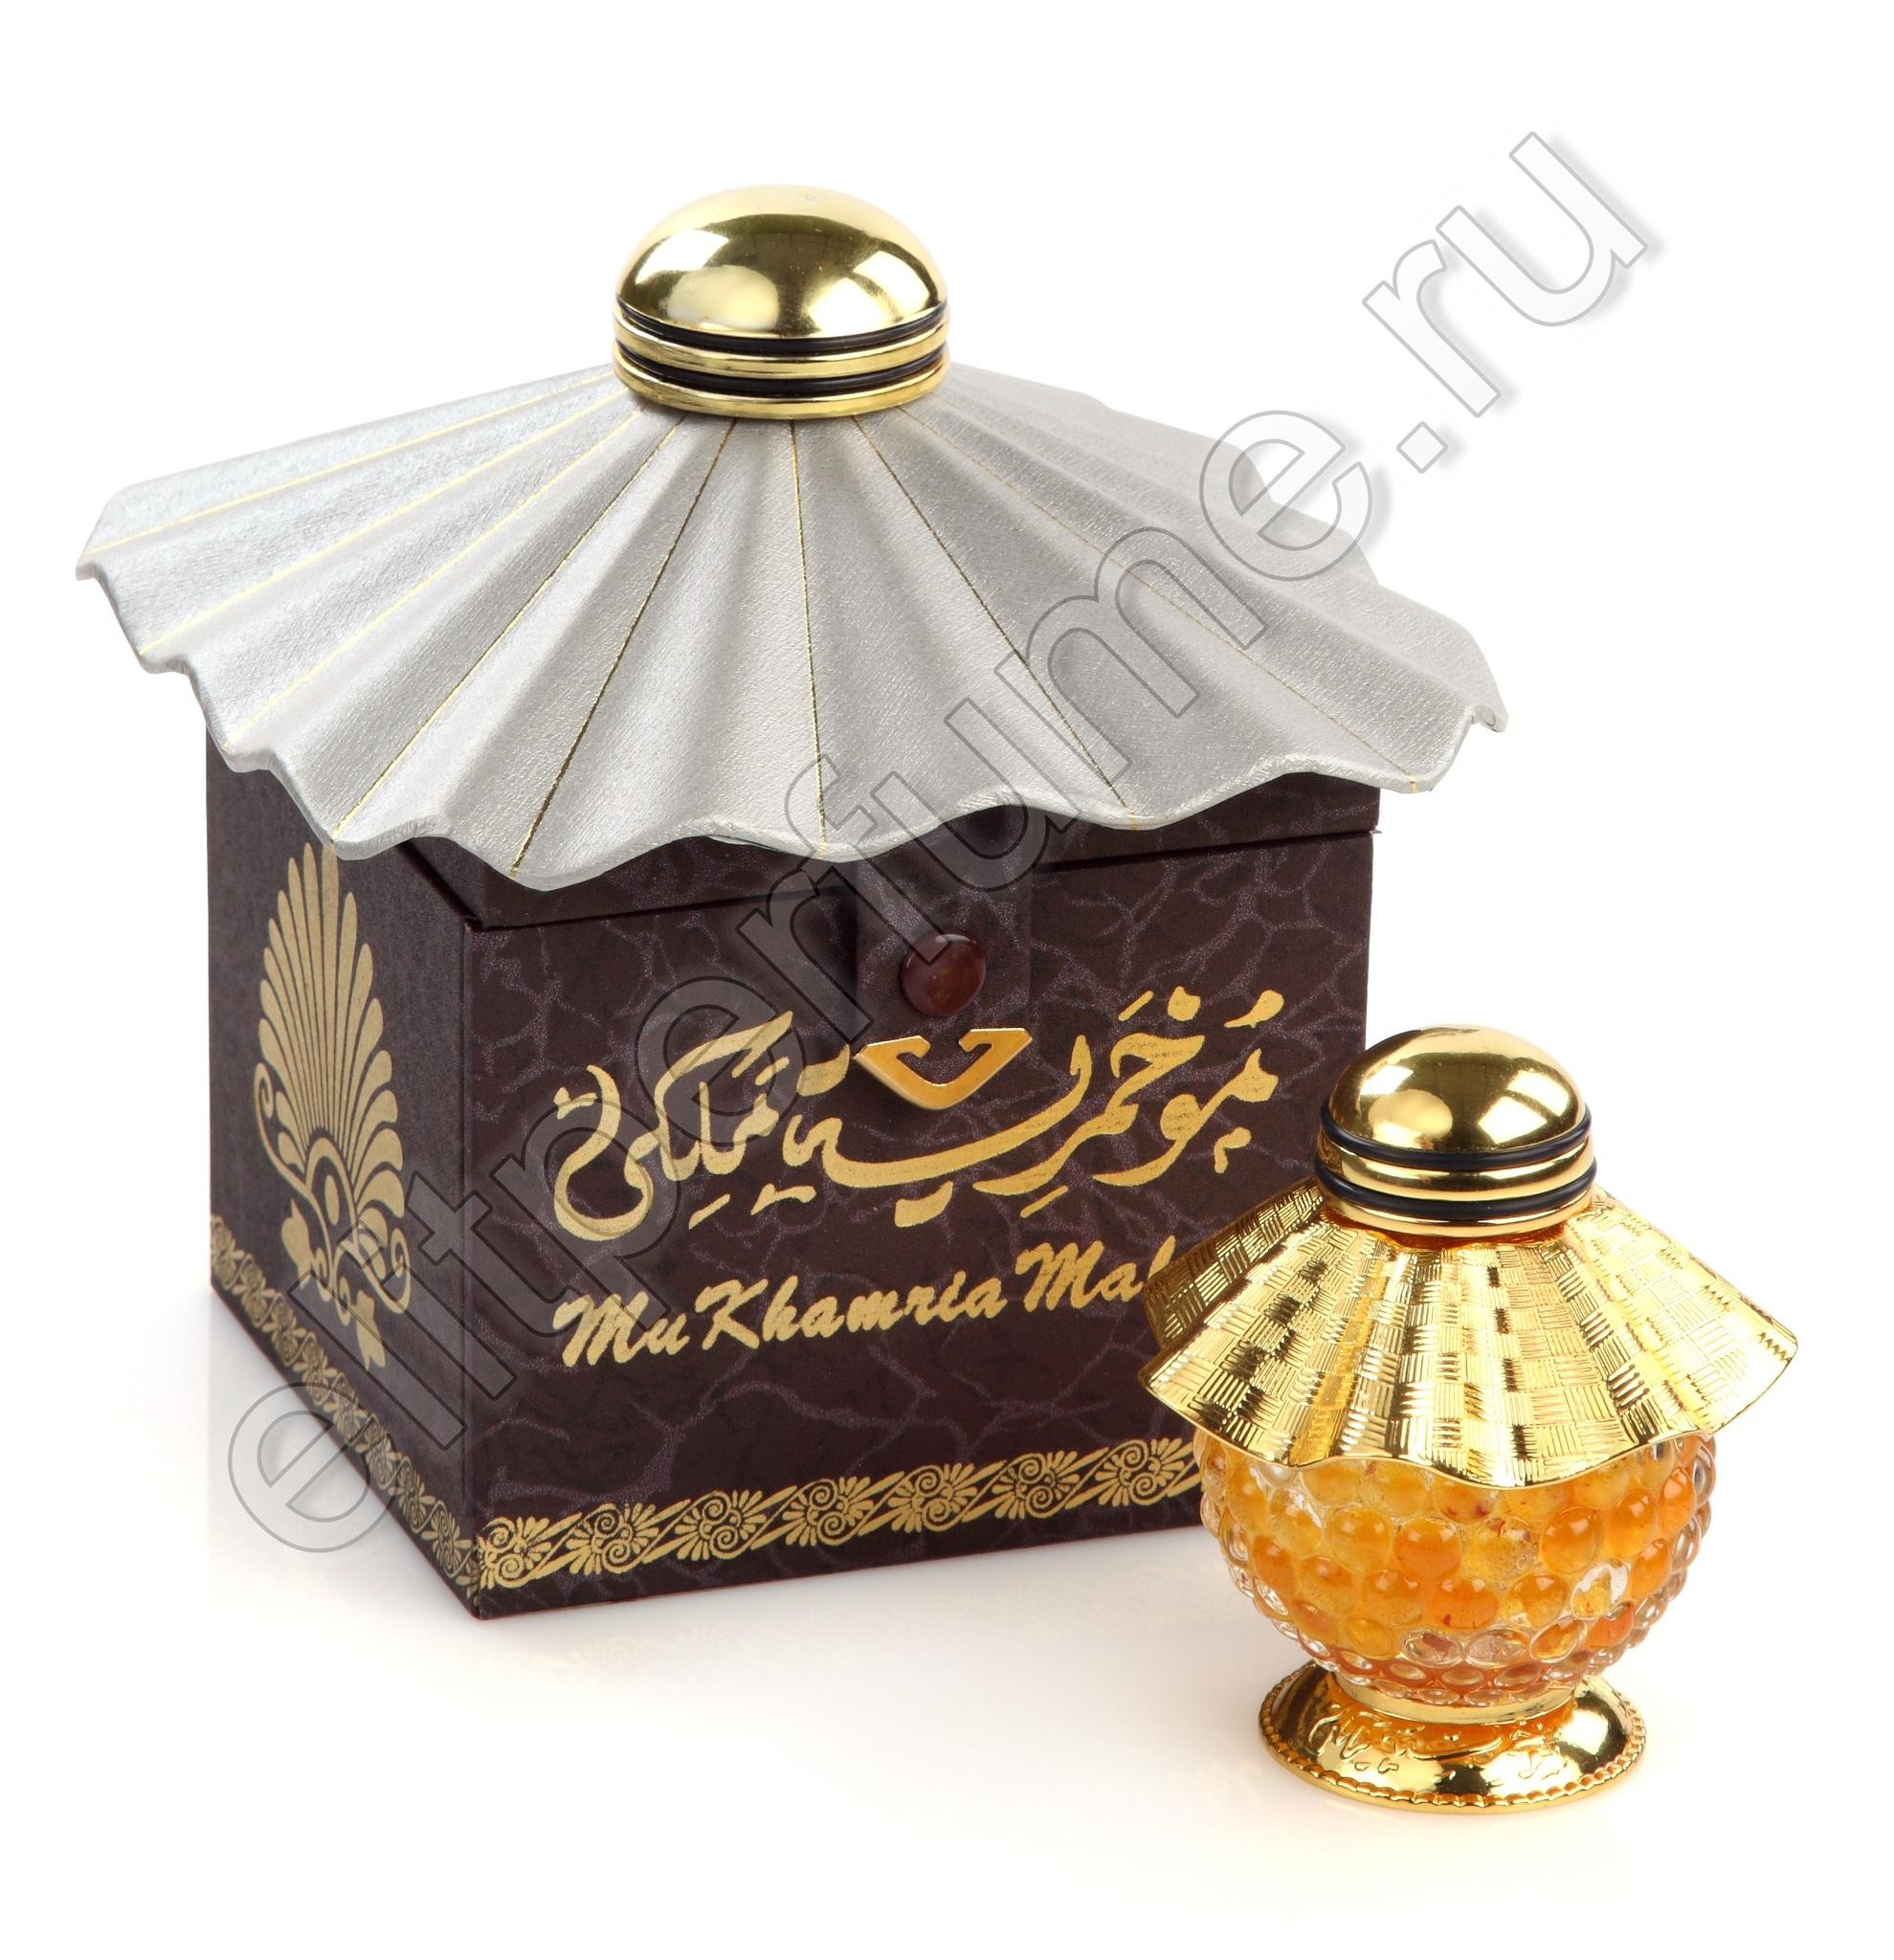 Арабские духи Мухамрия Малики Mukhamria Maliki